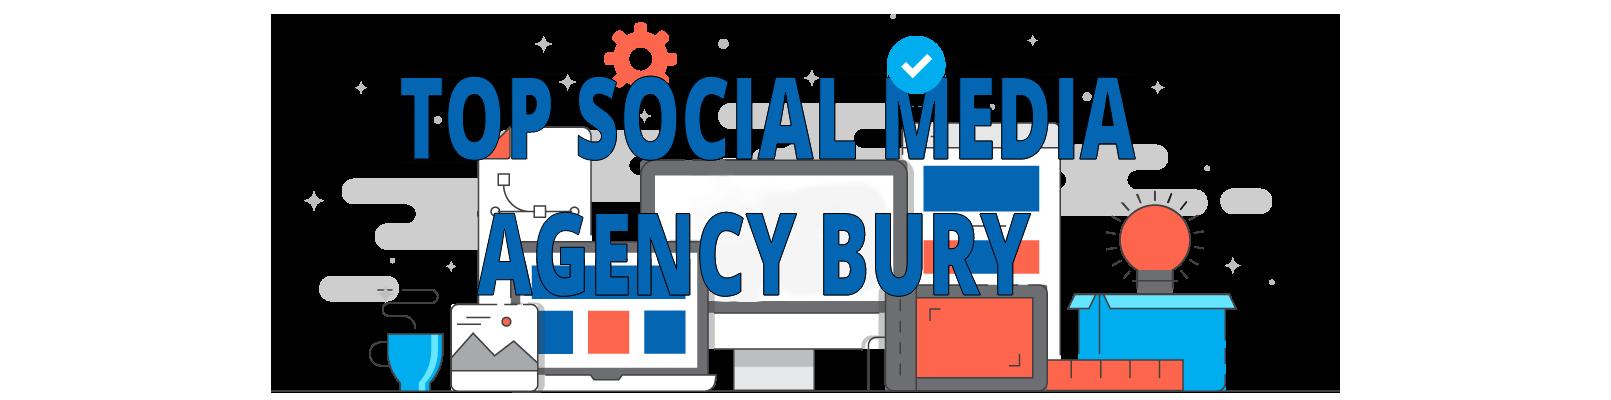 seek social top social media agency bury header with transparent background